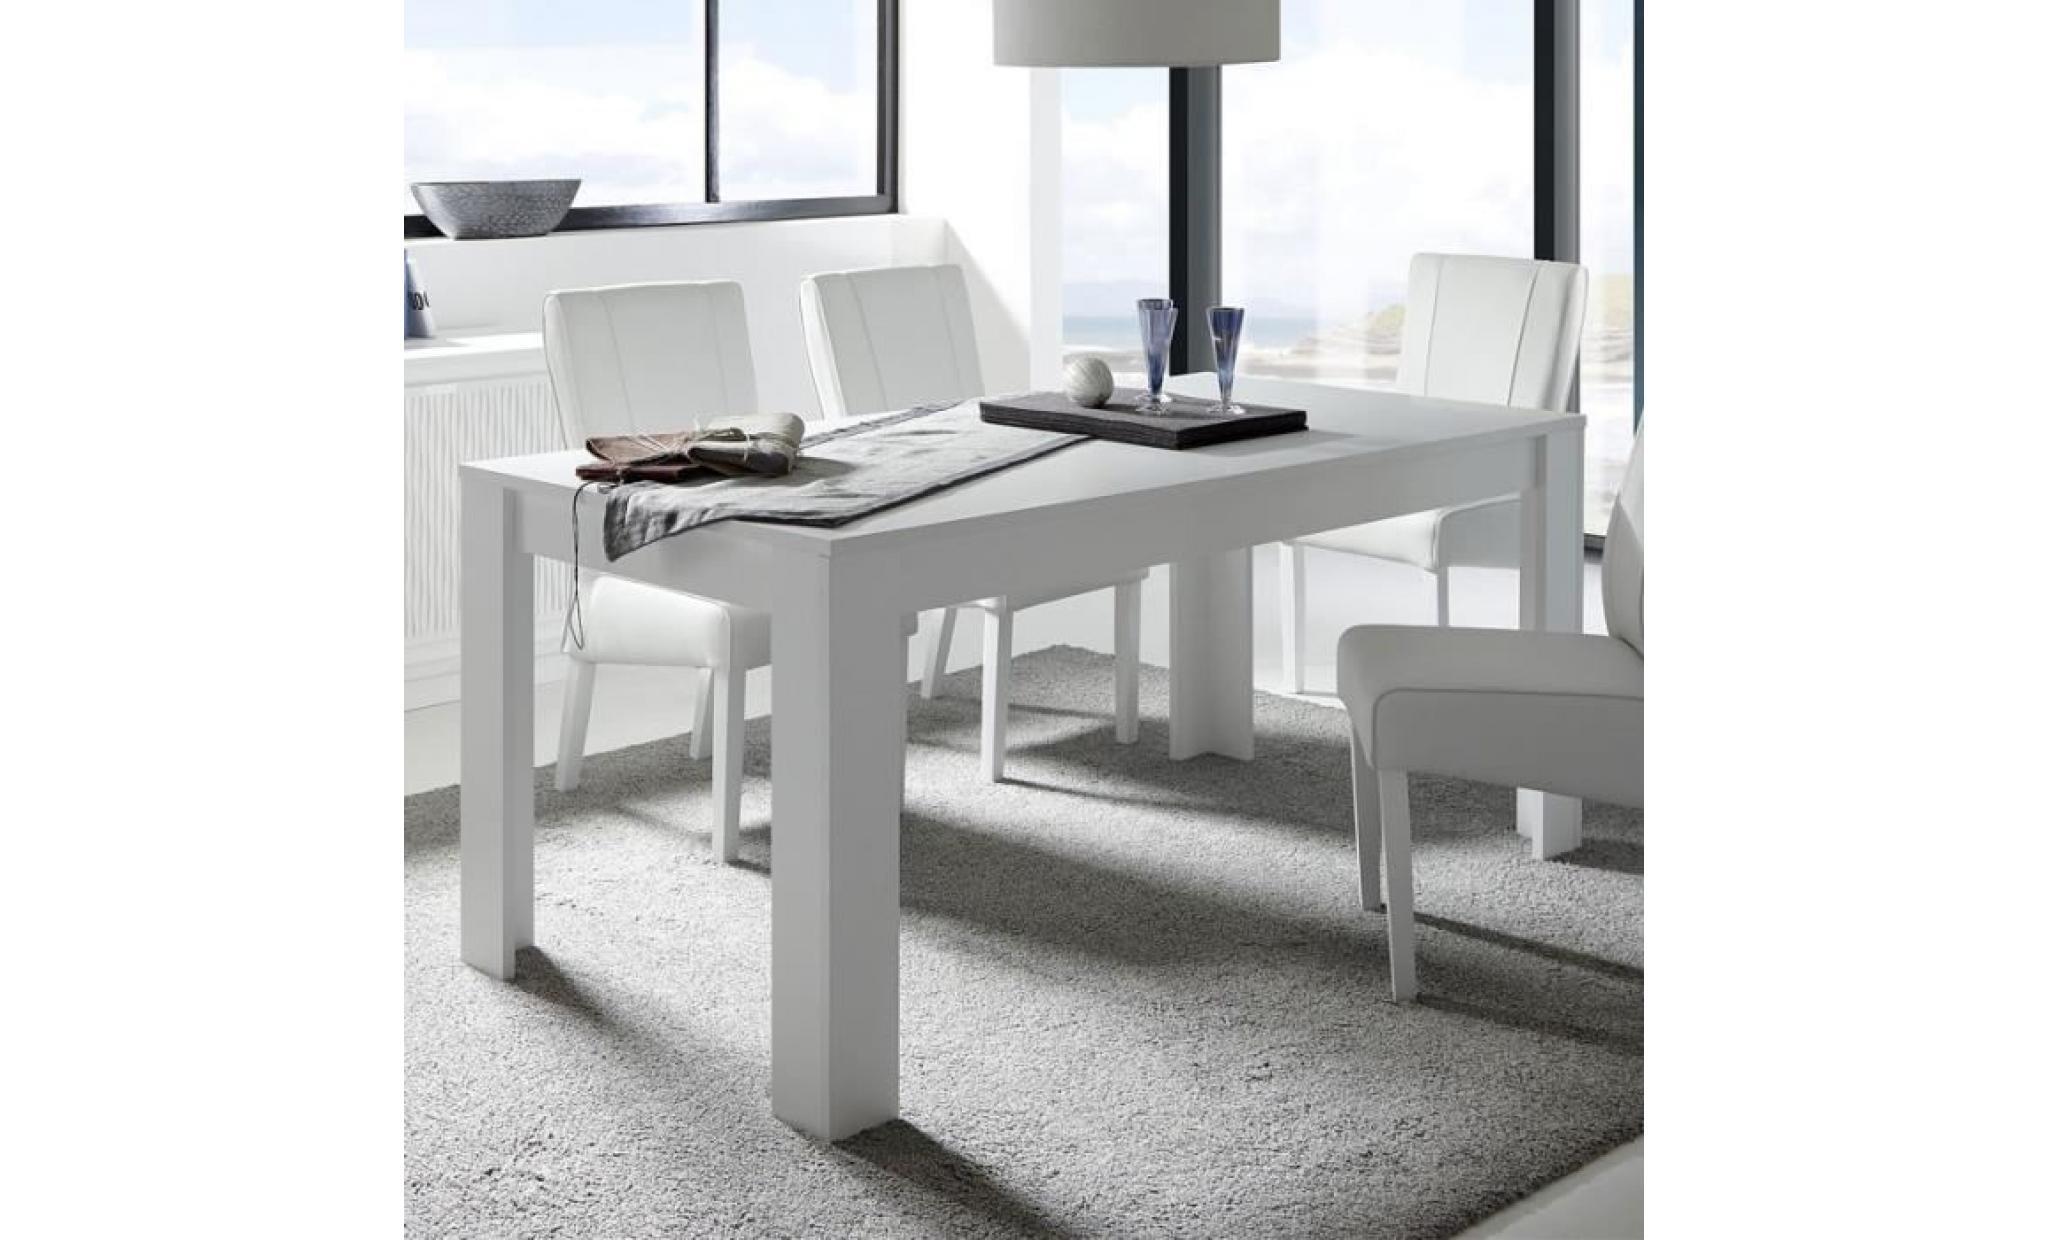 salle manger compl te relief bandes ondul es rimini n 1 l 137 x l 90 x h 79 achat vente. Black Bedroom Furniture Sets. Home Design Ideas